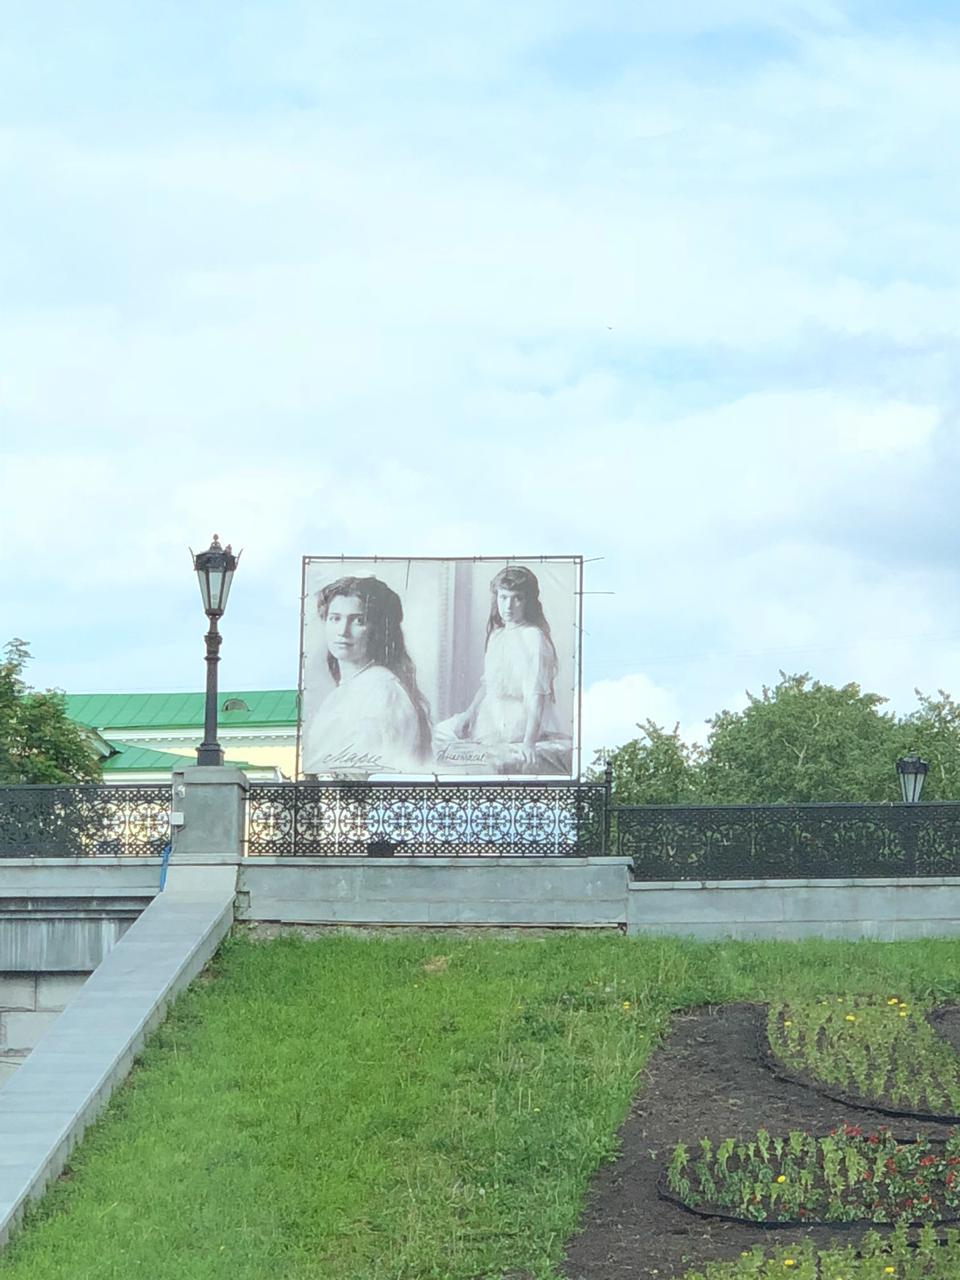 Fotos de Anastasia en Rusia